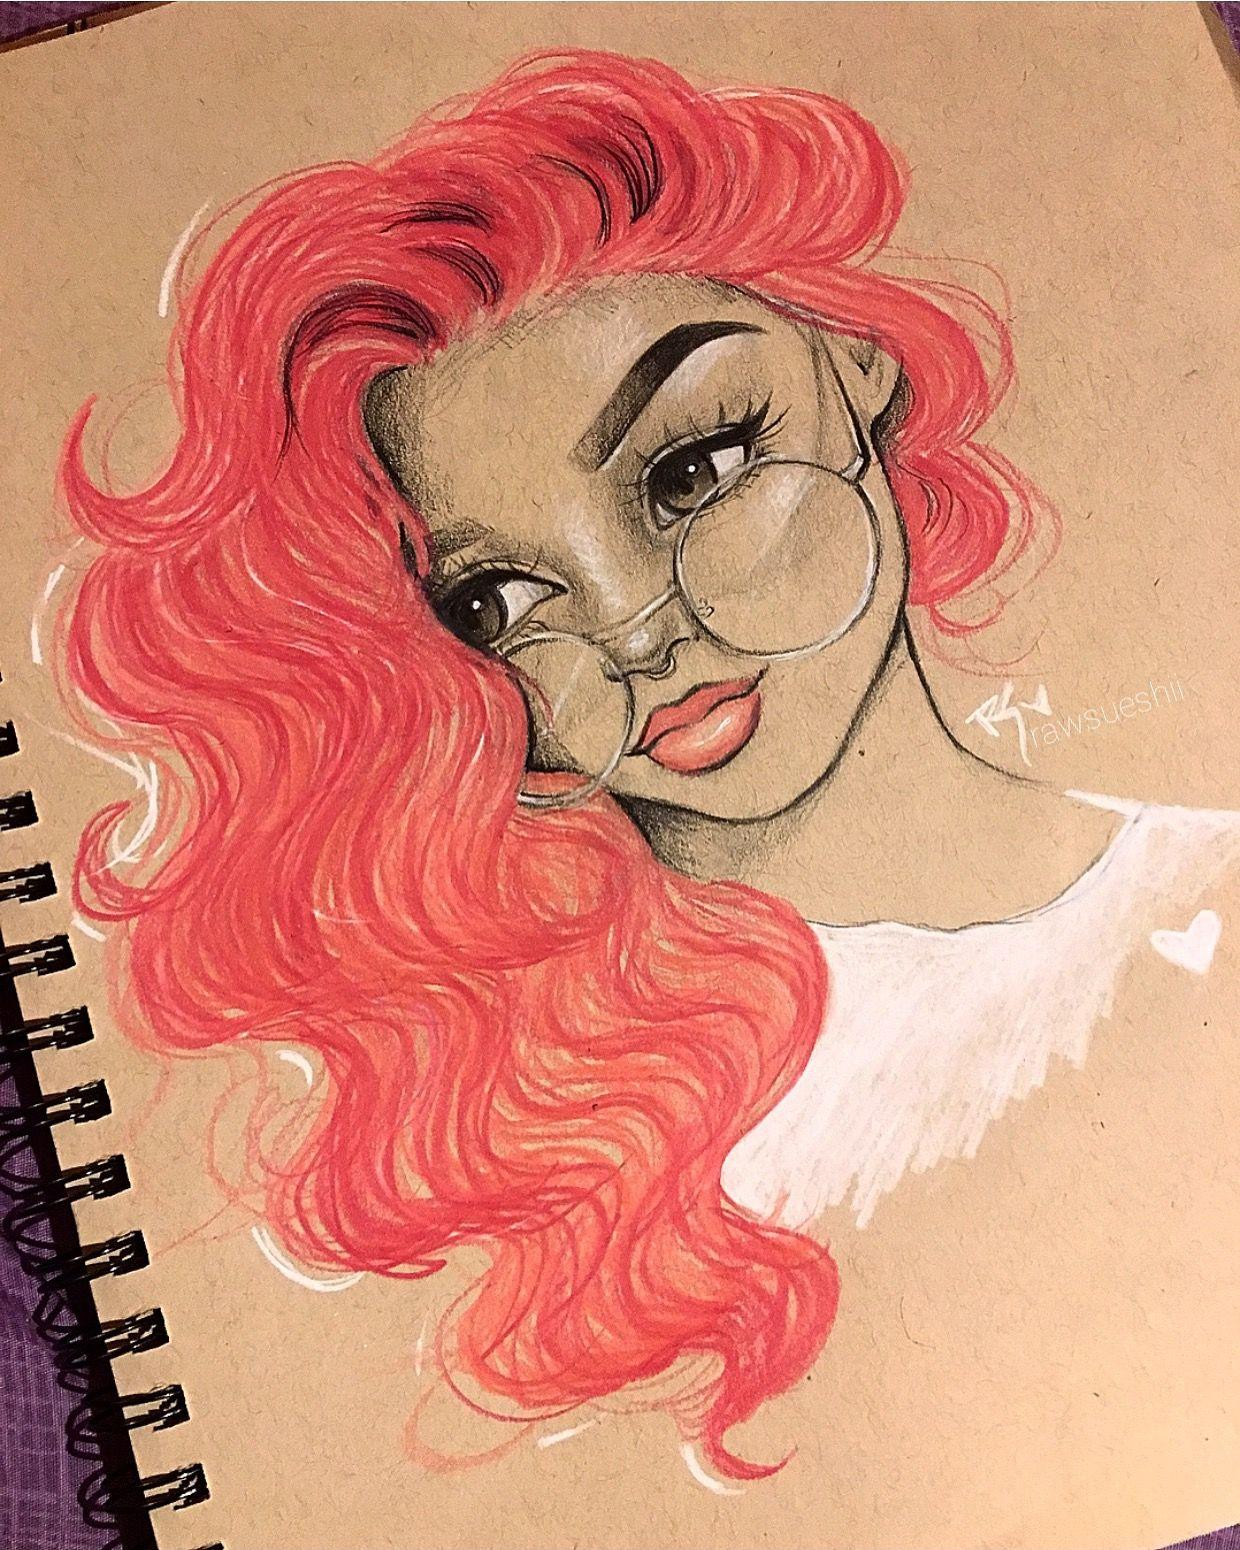 Epingle Par Rawsueshii Sur Rawsueshii Designs Portrait Au Crayon Dessin Cheuveux Dessin Visage